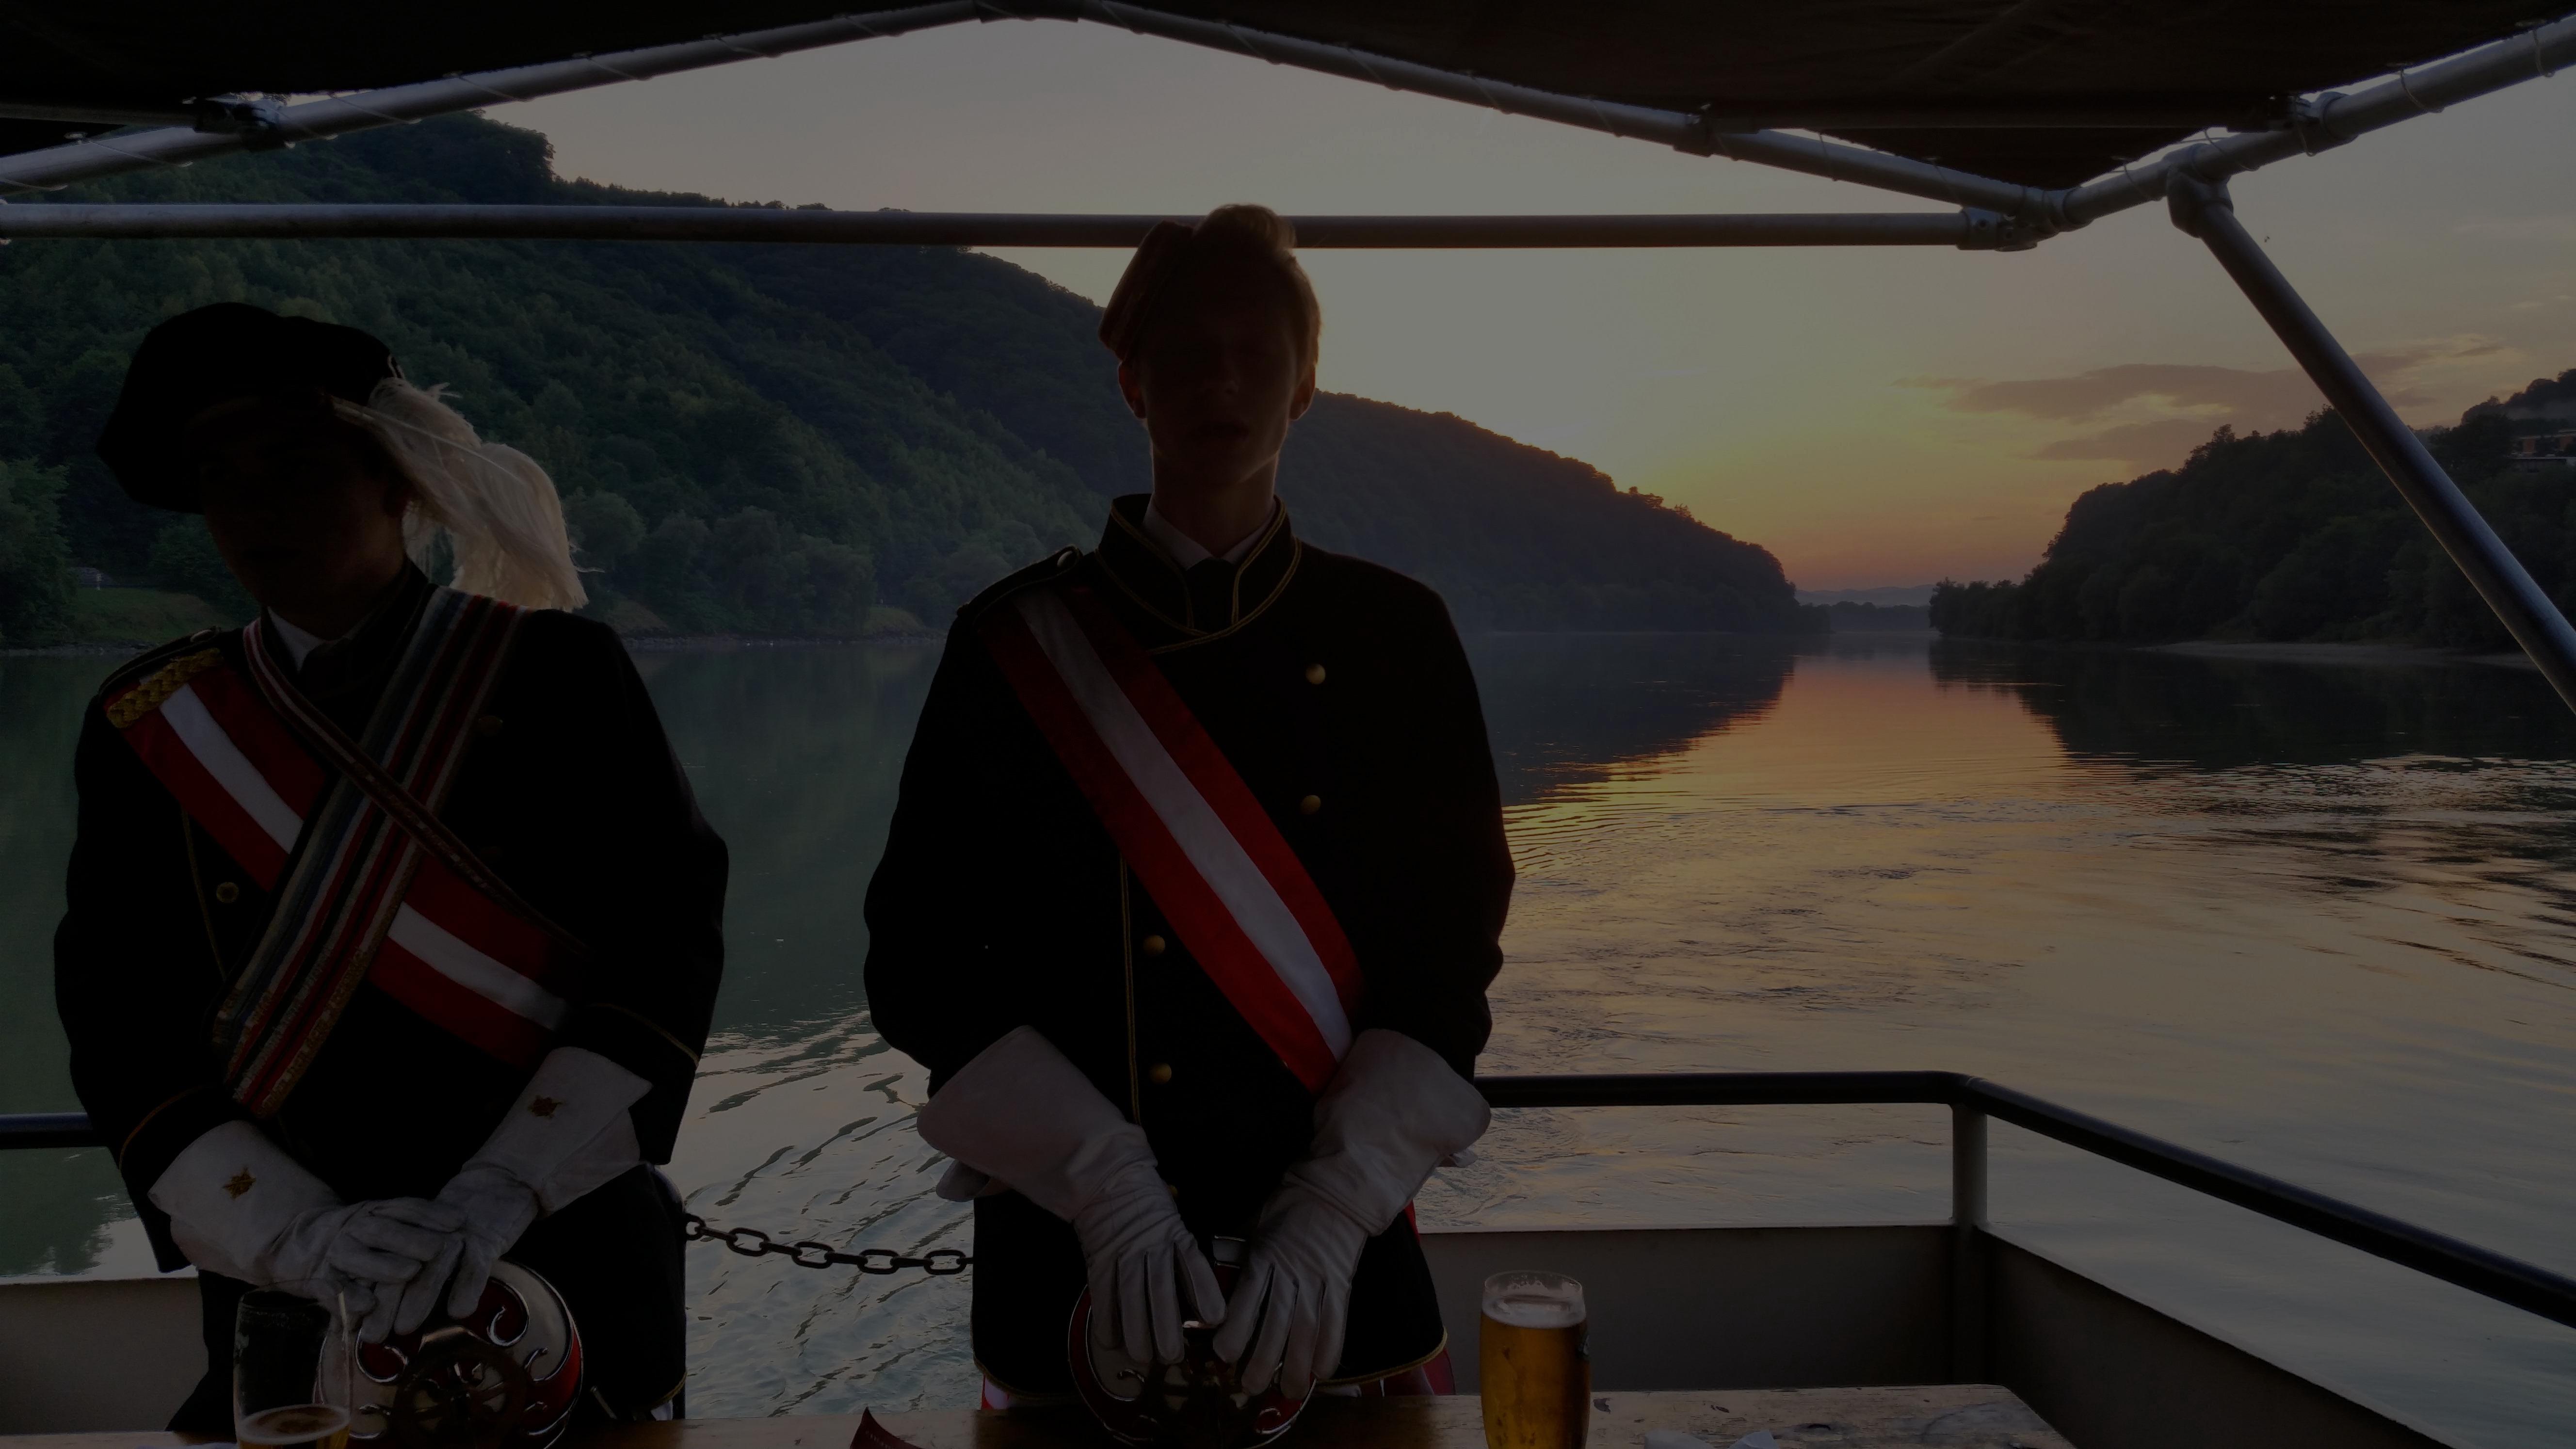 Amelungia auf der Donau